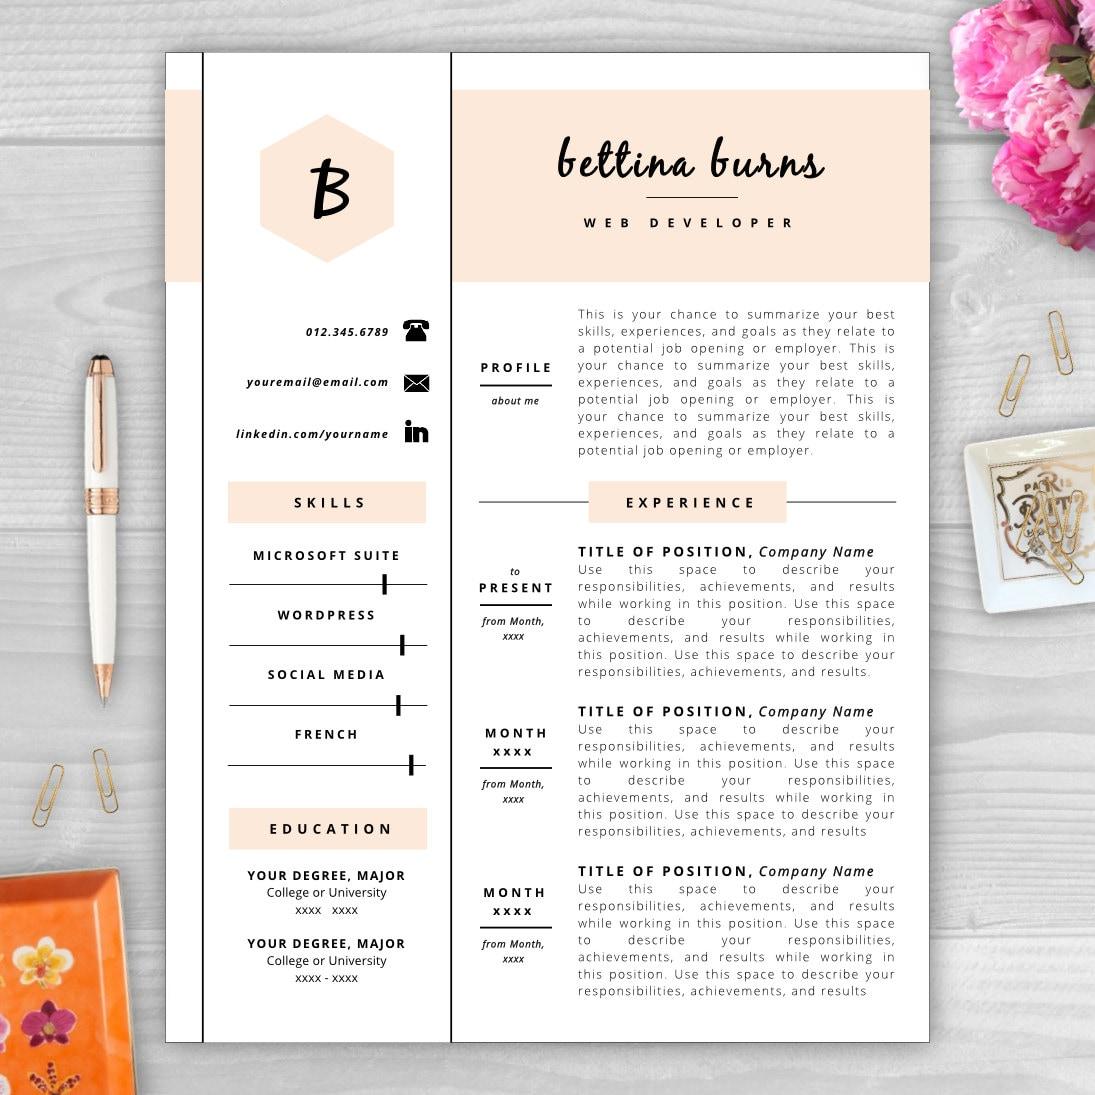 monogram resume template resume template word resume cover. Black Bedroom Furniture Sets. Home Design Ideas